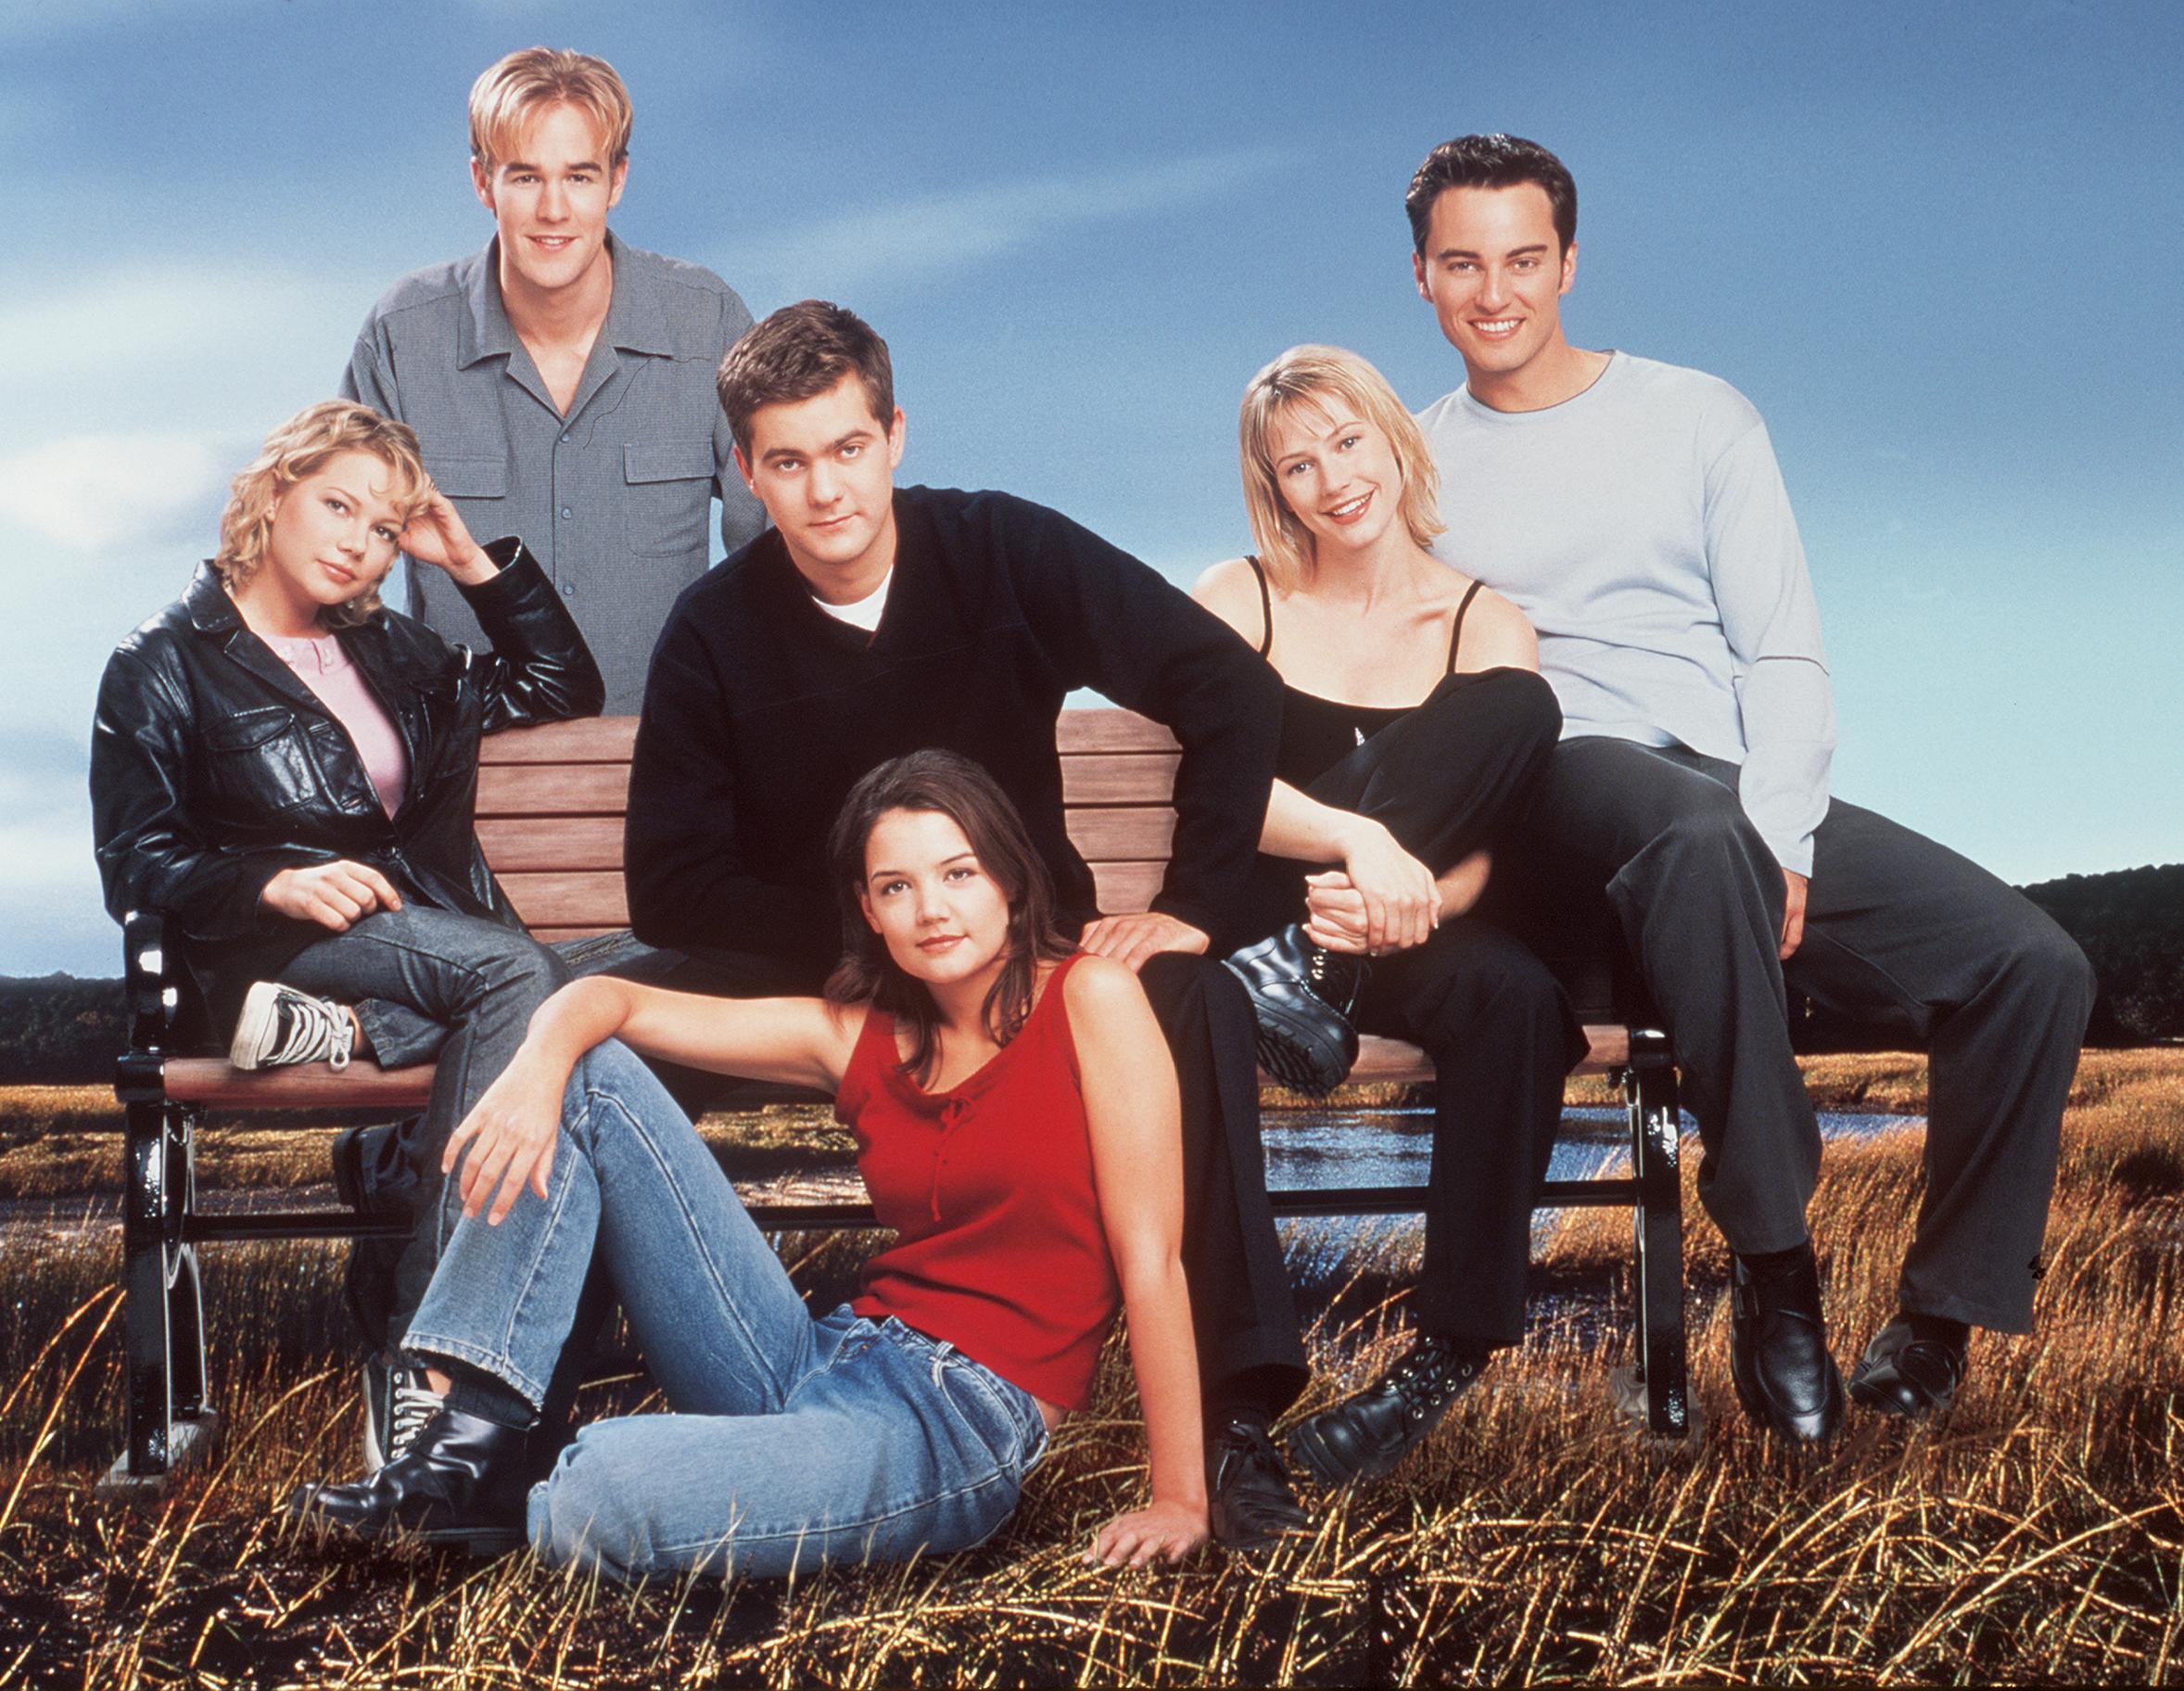 James Van Der Beek, Katie Holmes, Joshua Jackson, Meredith Monroe, Kerr Smith, and Michelle Williams in Dawson's Creek (1998)